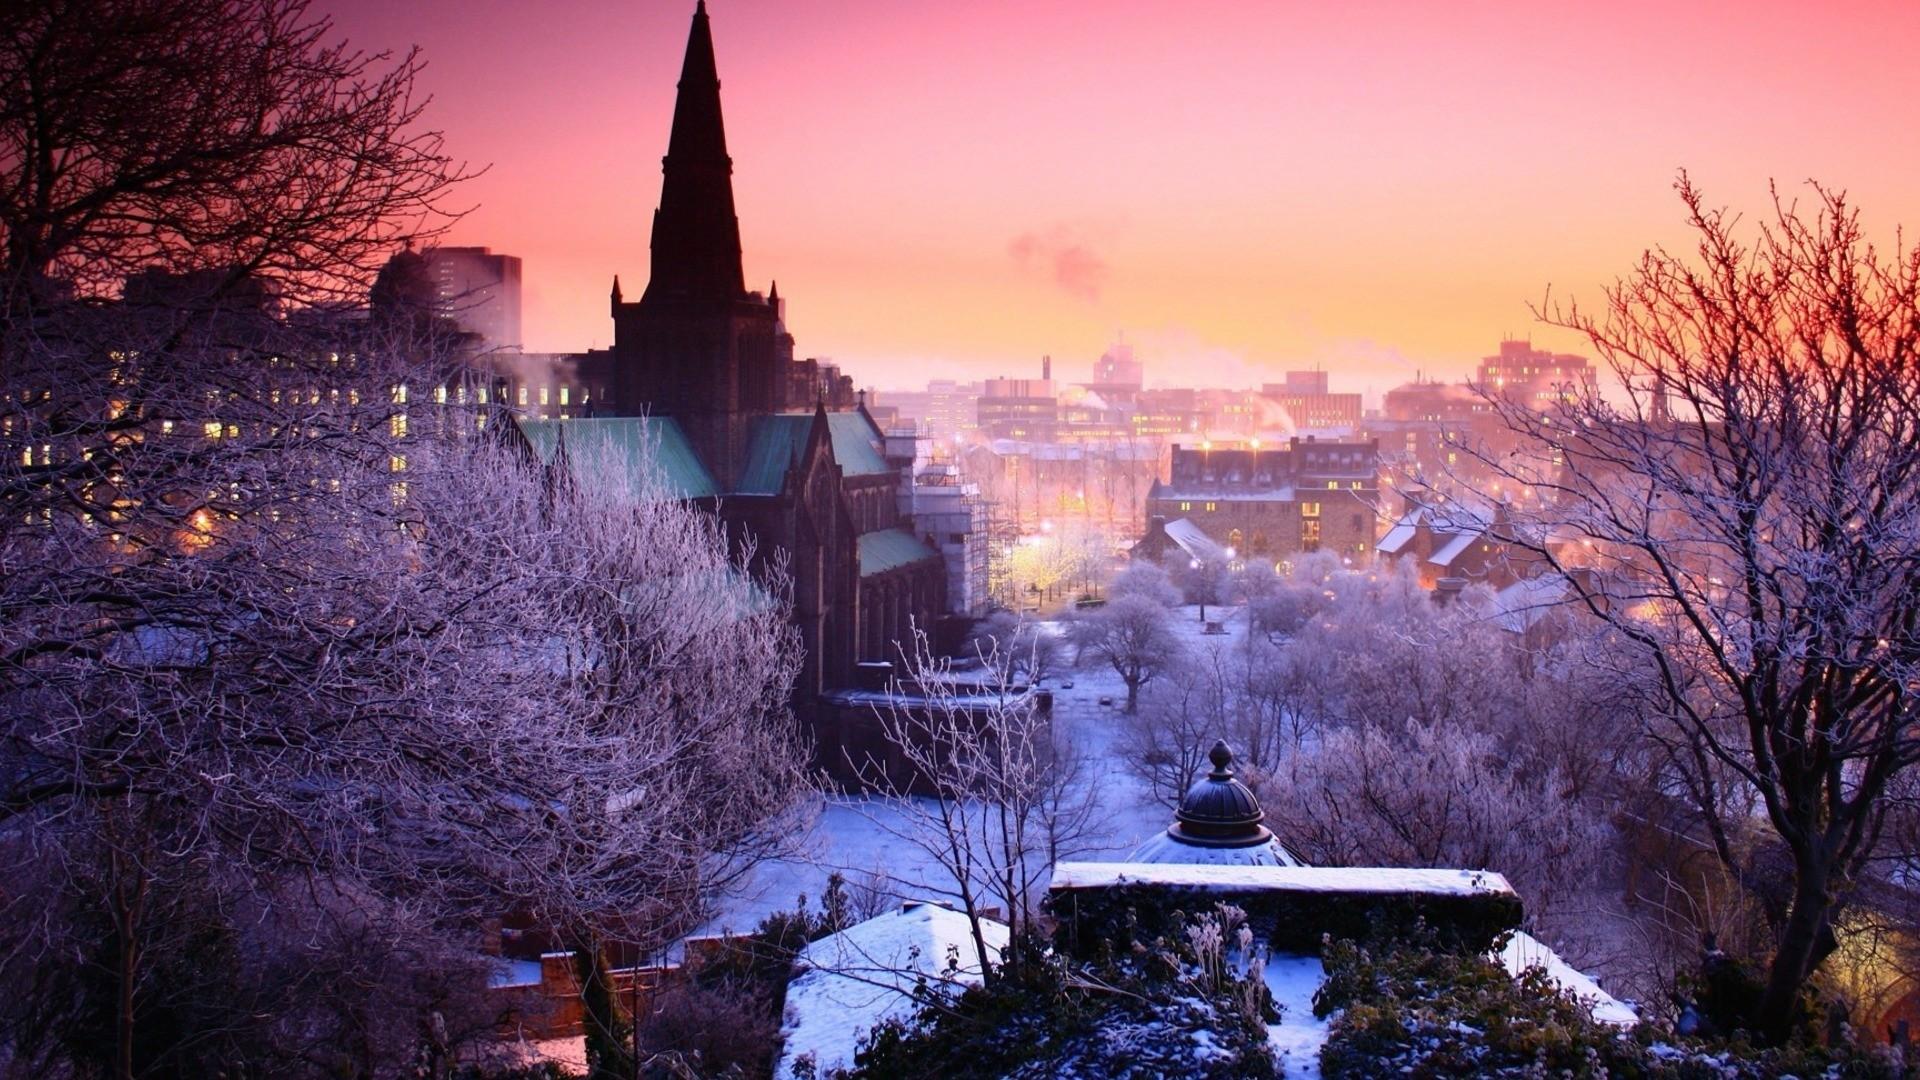 Wallpaper city, night, winter, sky, trees